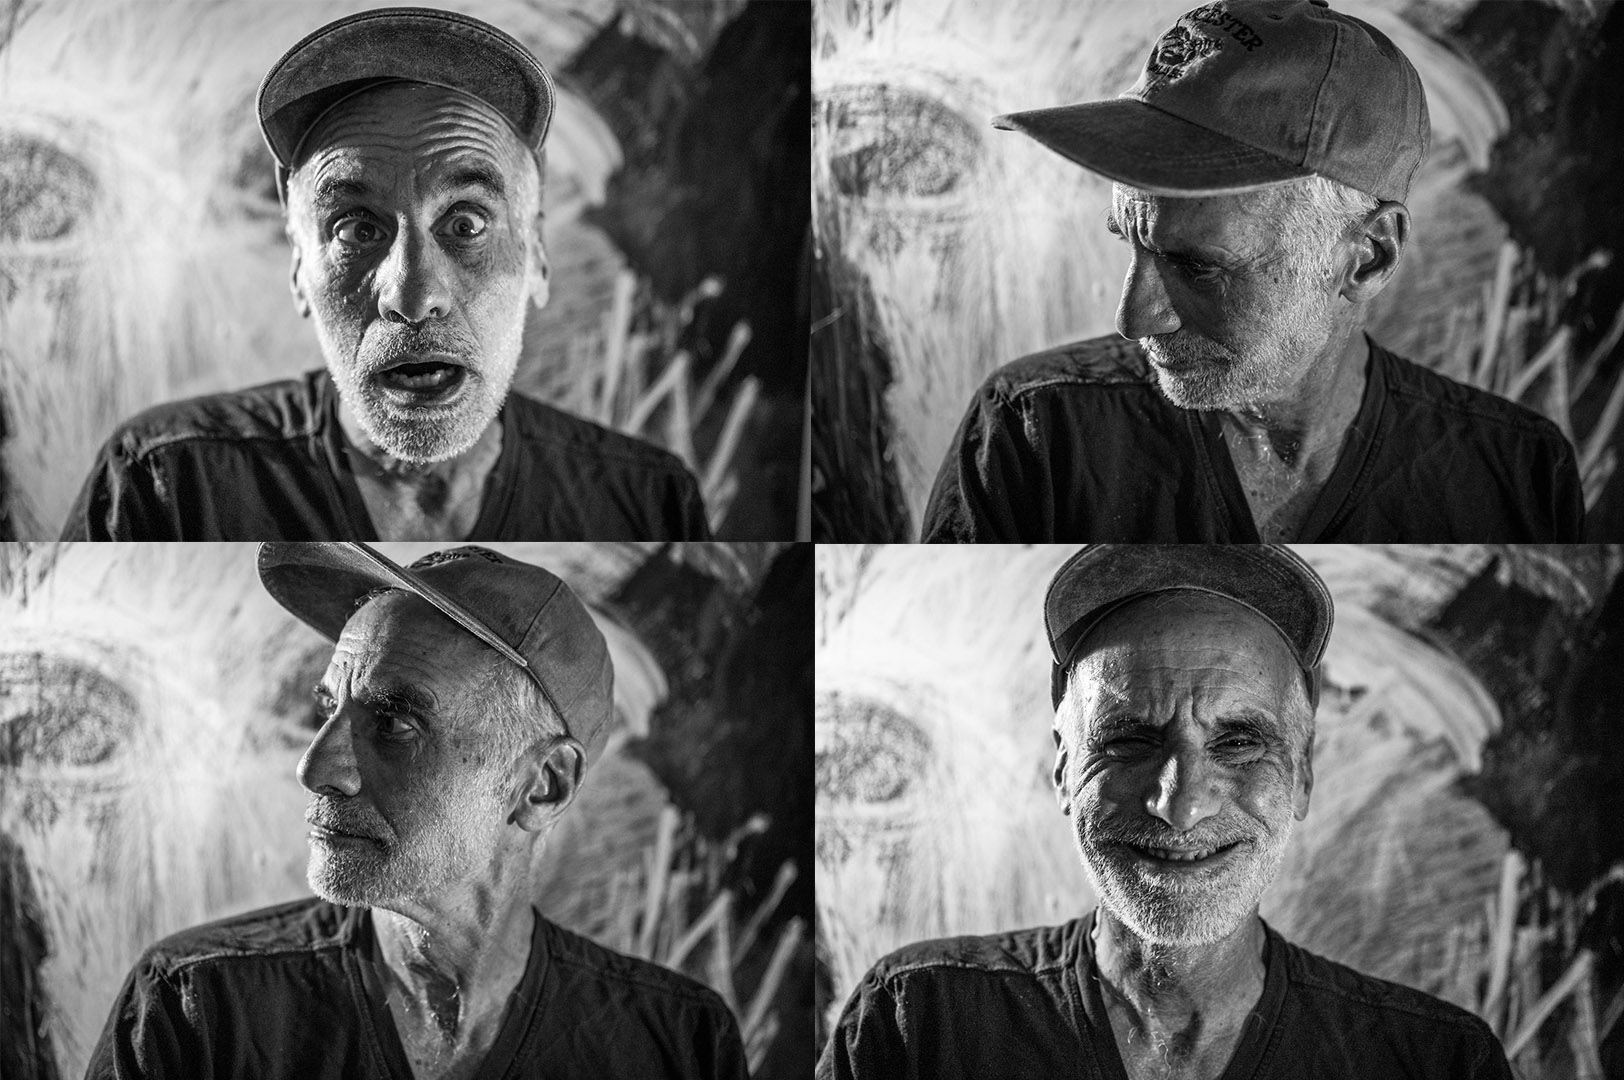 sarkin quad bw portraits.jpg